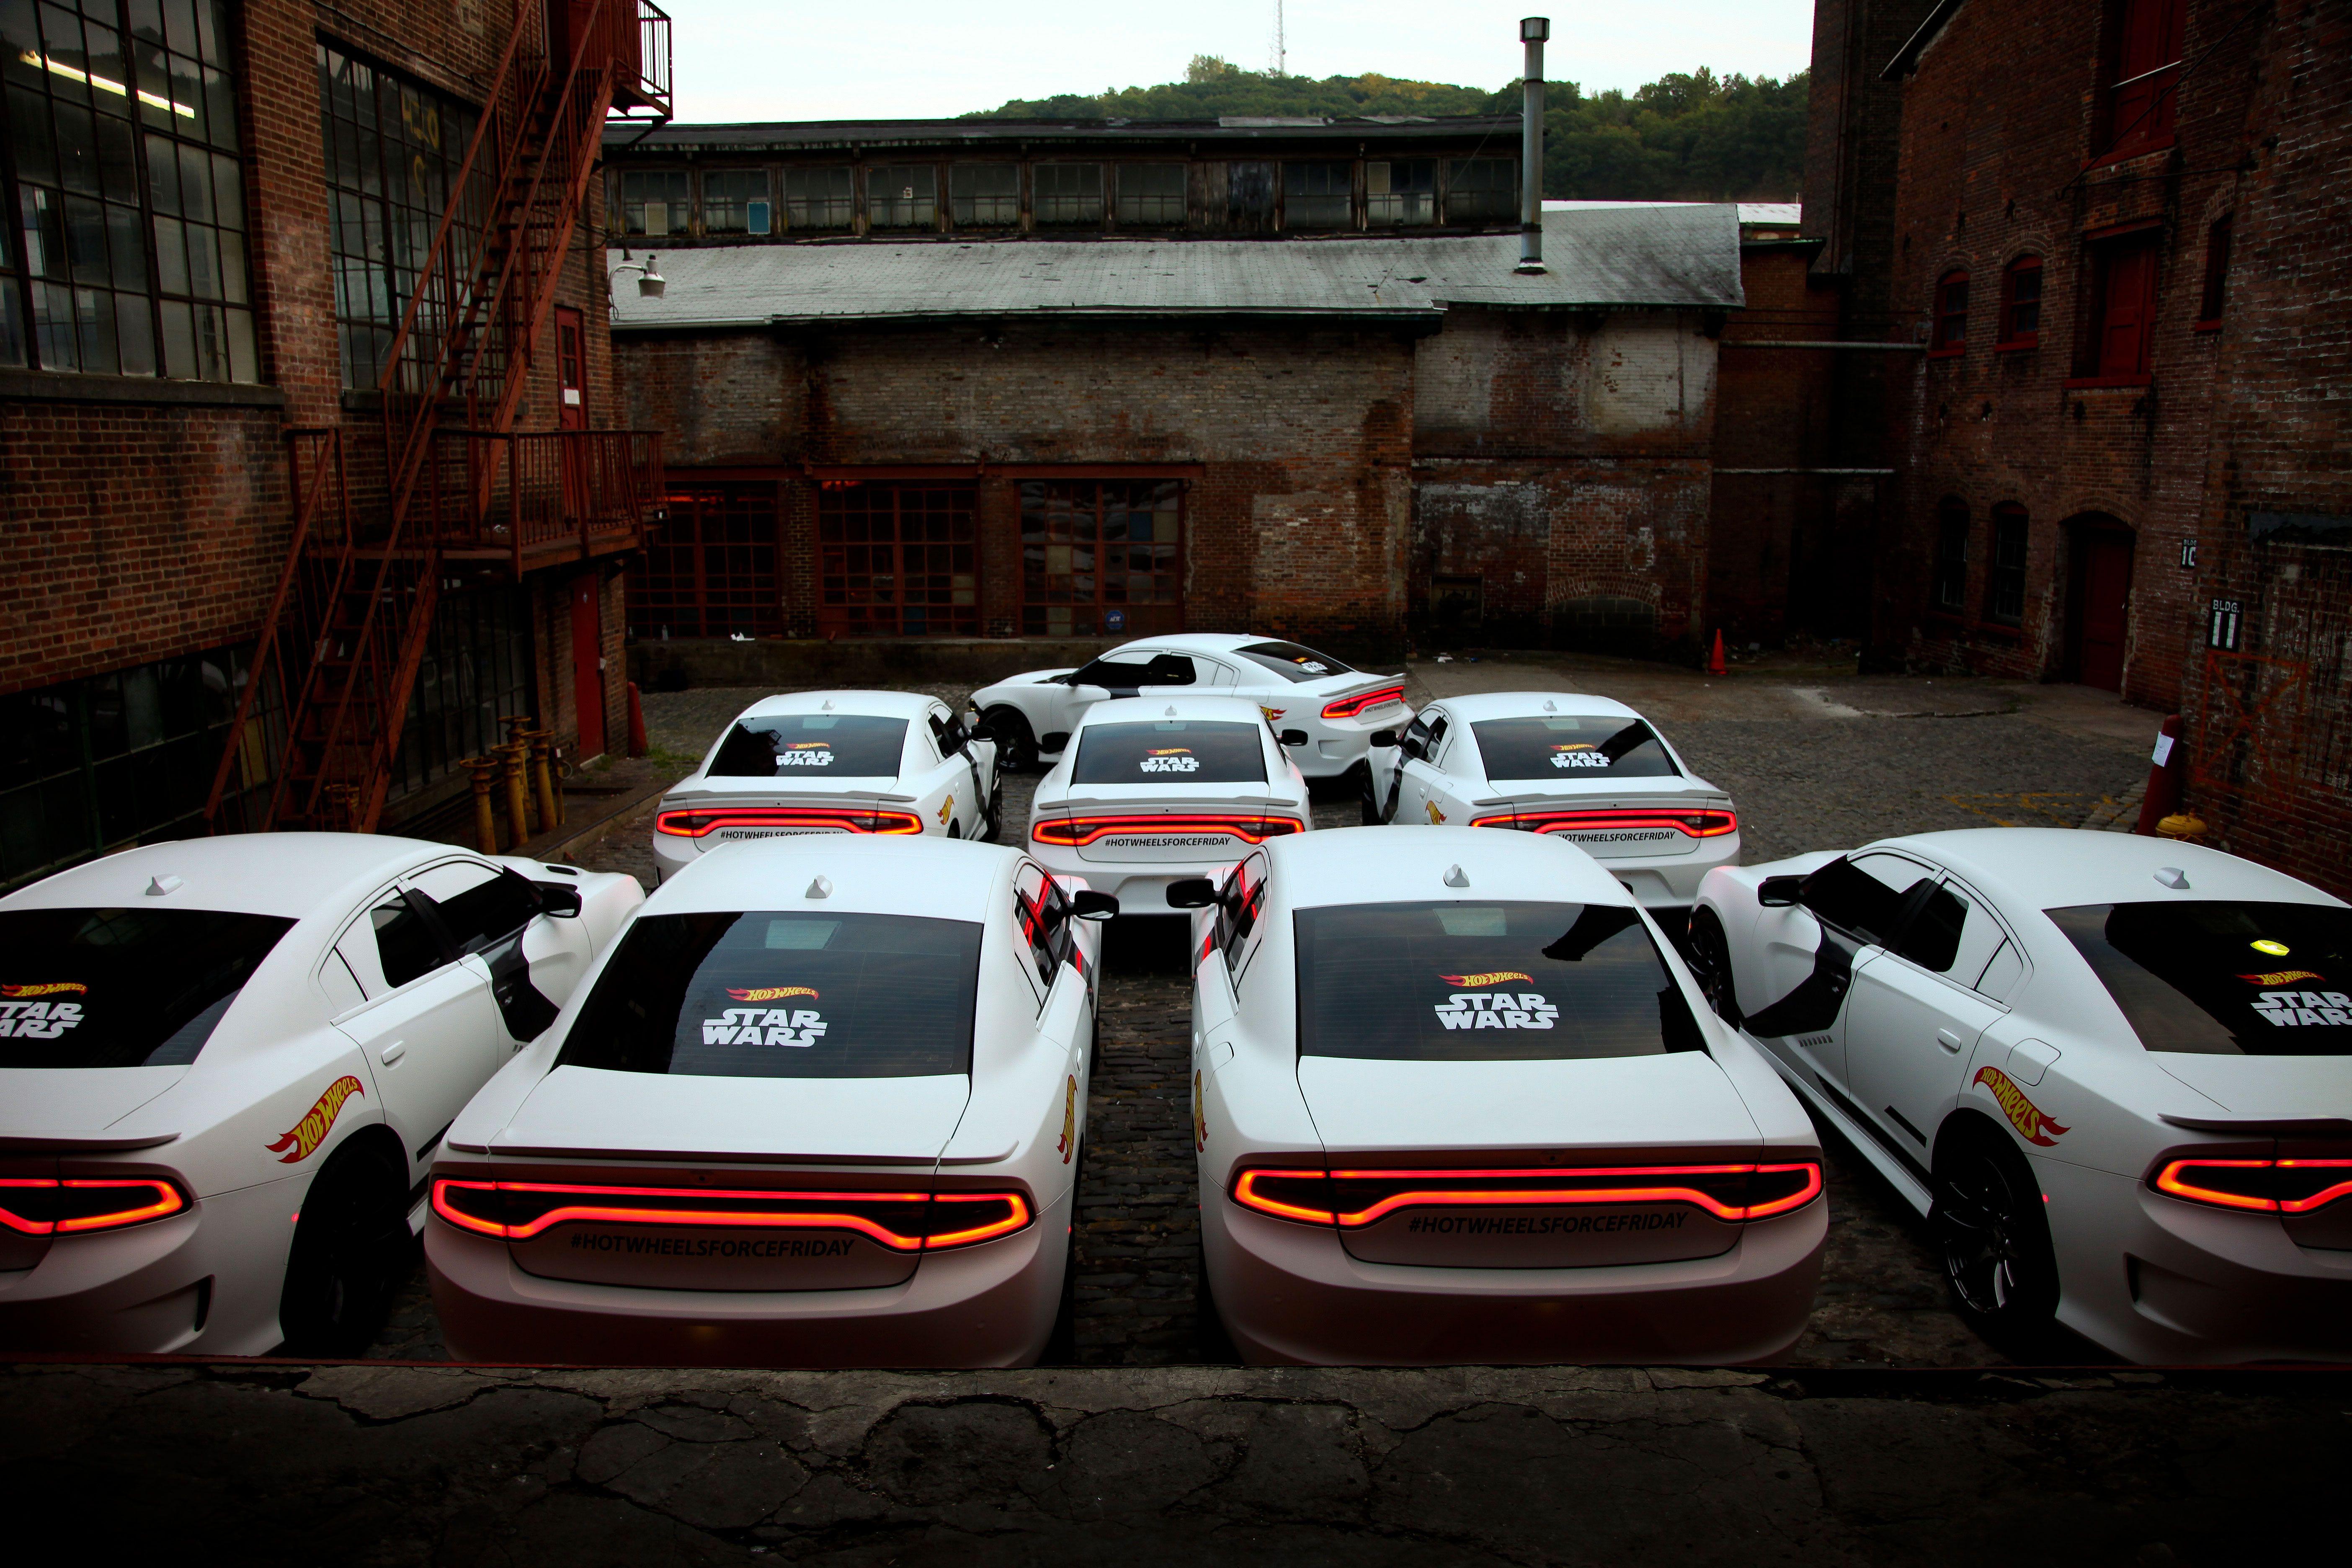 Star Wars Hot Wheels Stormtrooper Dodge Charger Hellcat Collider - Cool cars jacksonville